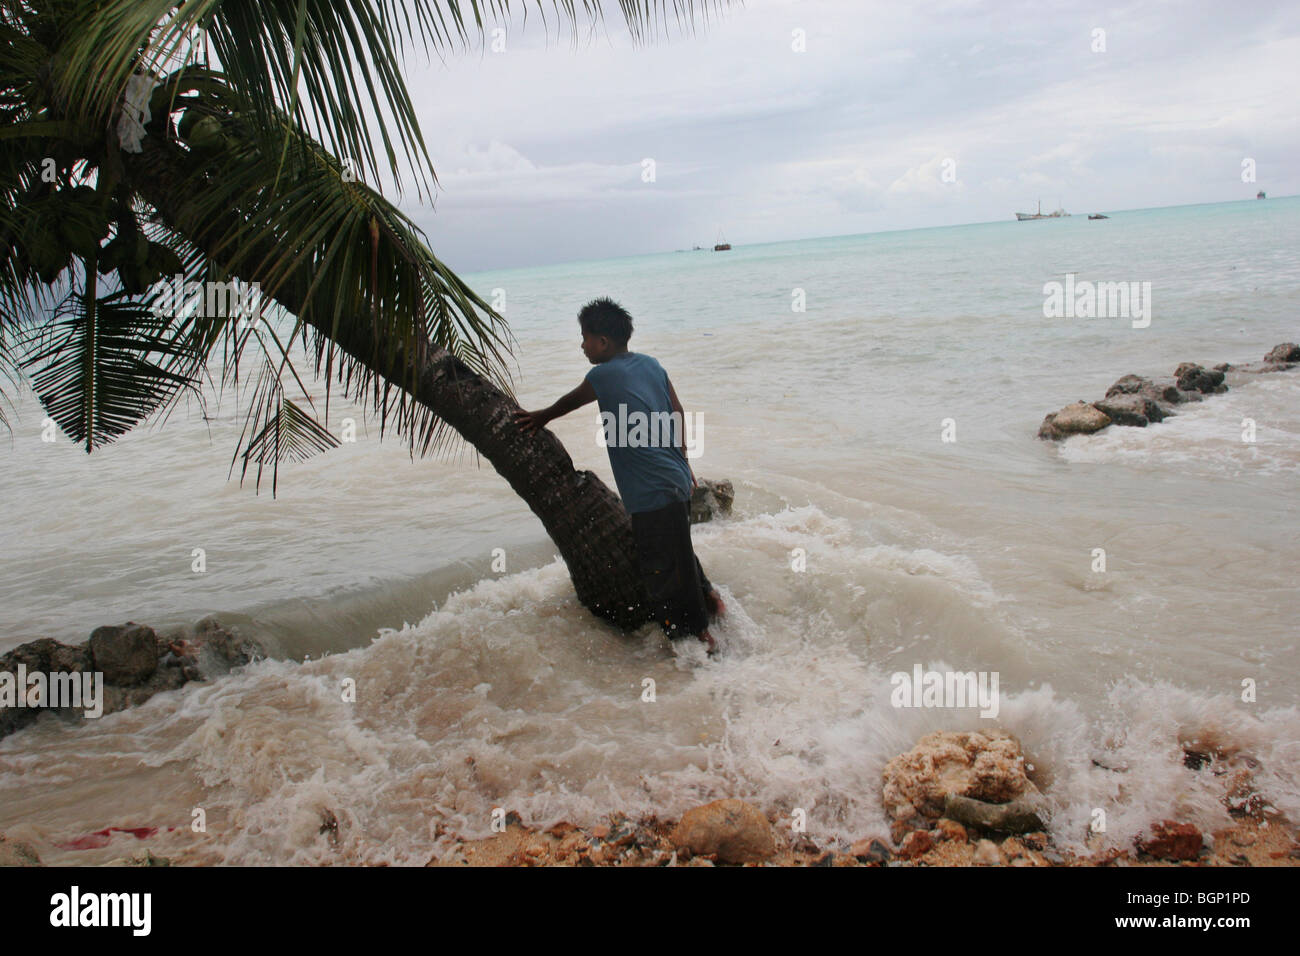 King tides flood property on Kiribati atoll - Stock Image